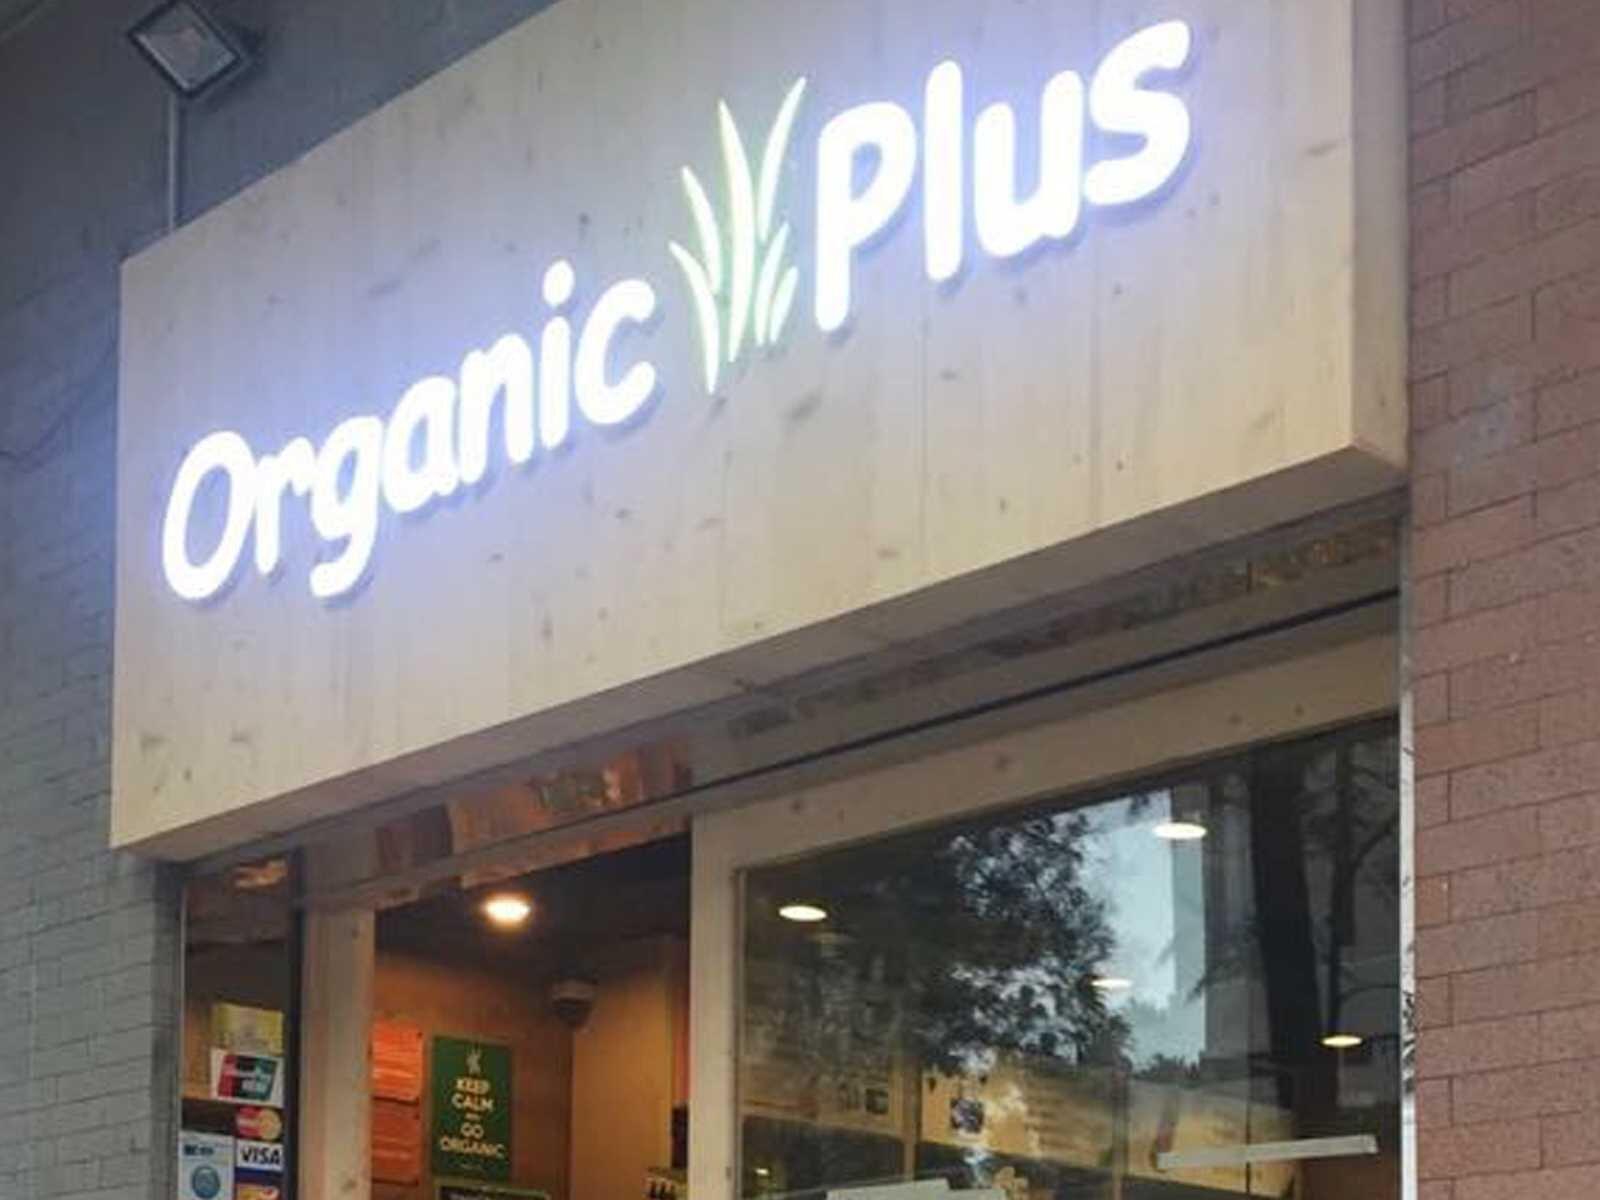 Organic Plus   Lei King Wan Shop  Business Hours:10am-8pm Mobile:2833 6238 Email:lkw@organicplus.com.hk Address:Shop GD06, Site D, 25 Tai On Street, Lei King Wan,  Sai Wan Ho, H.K.